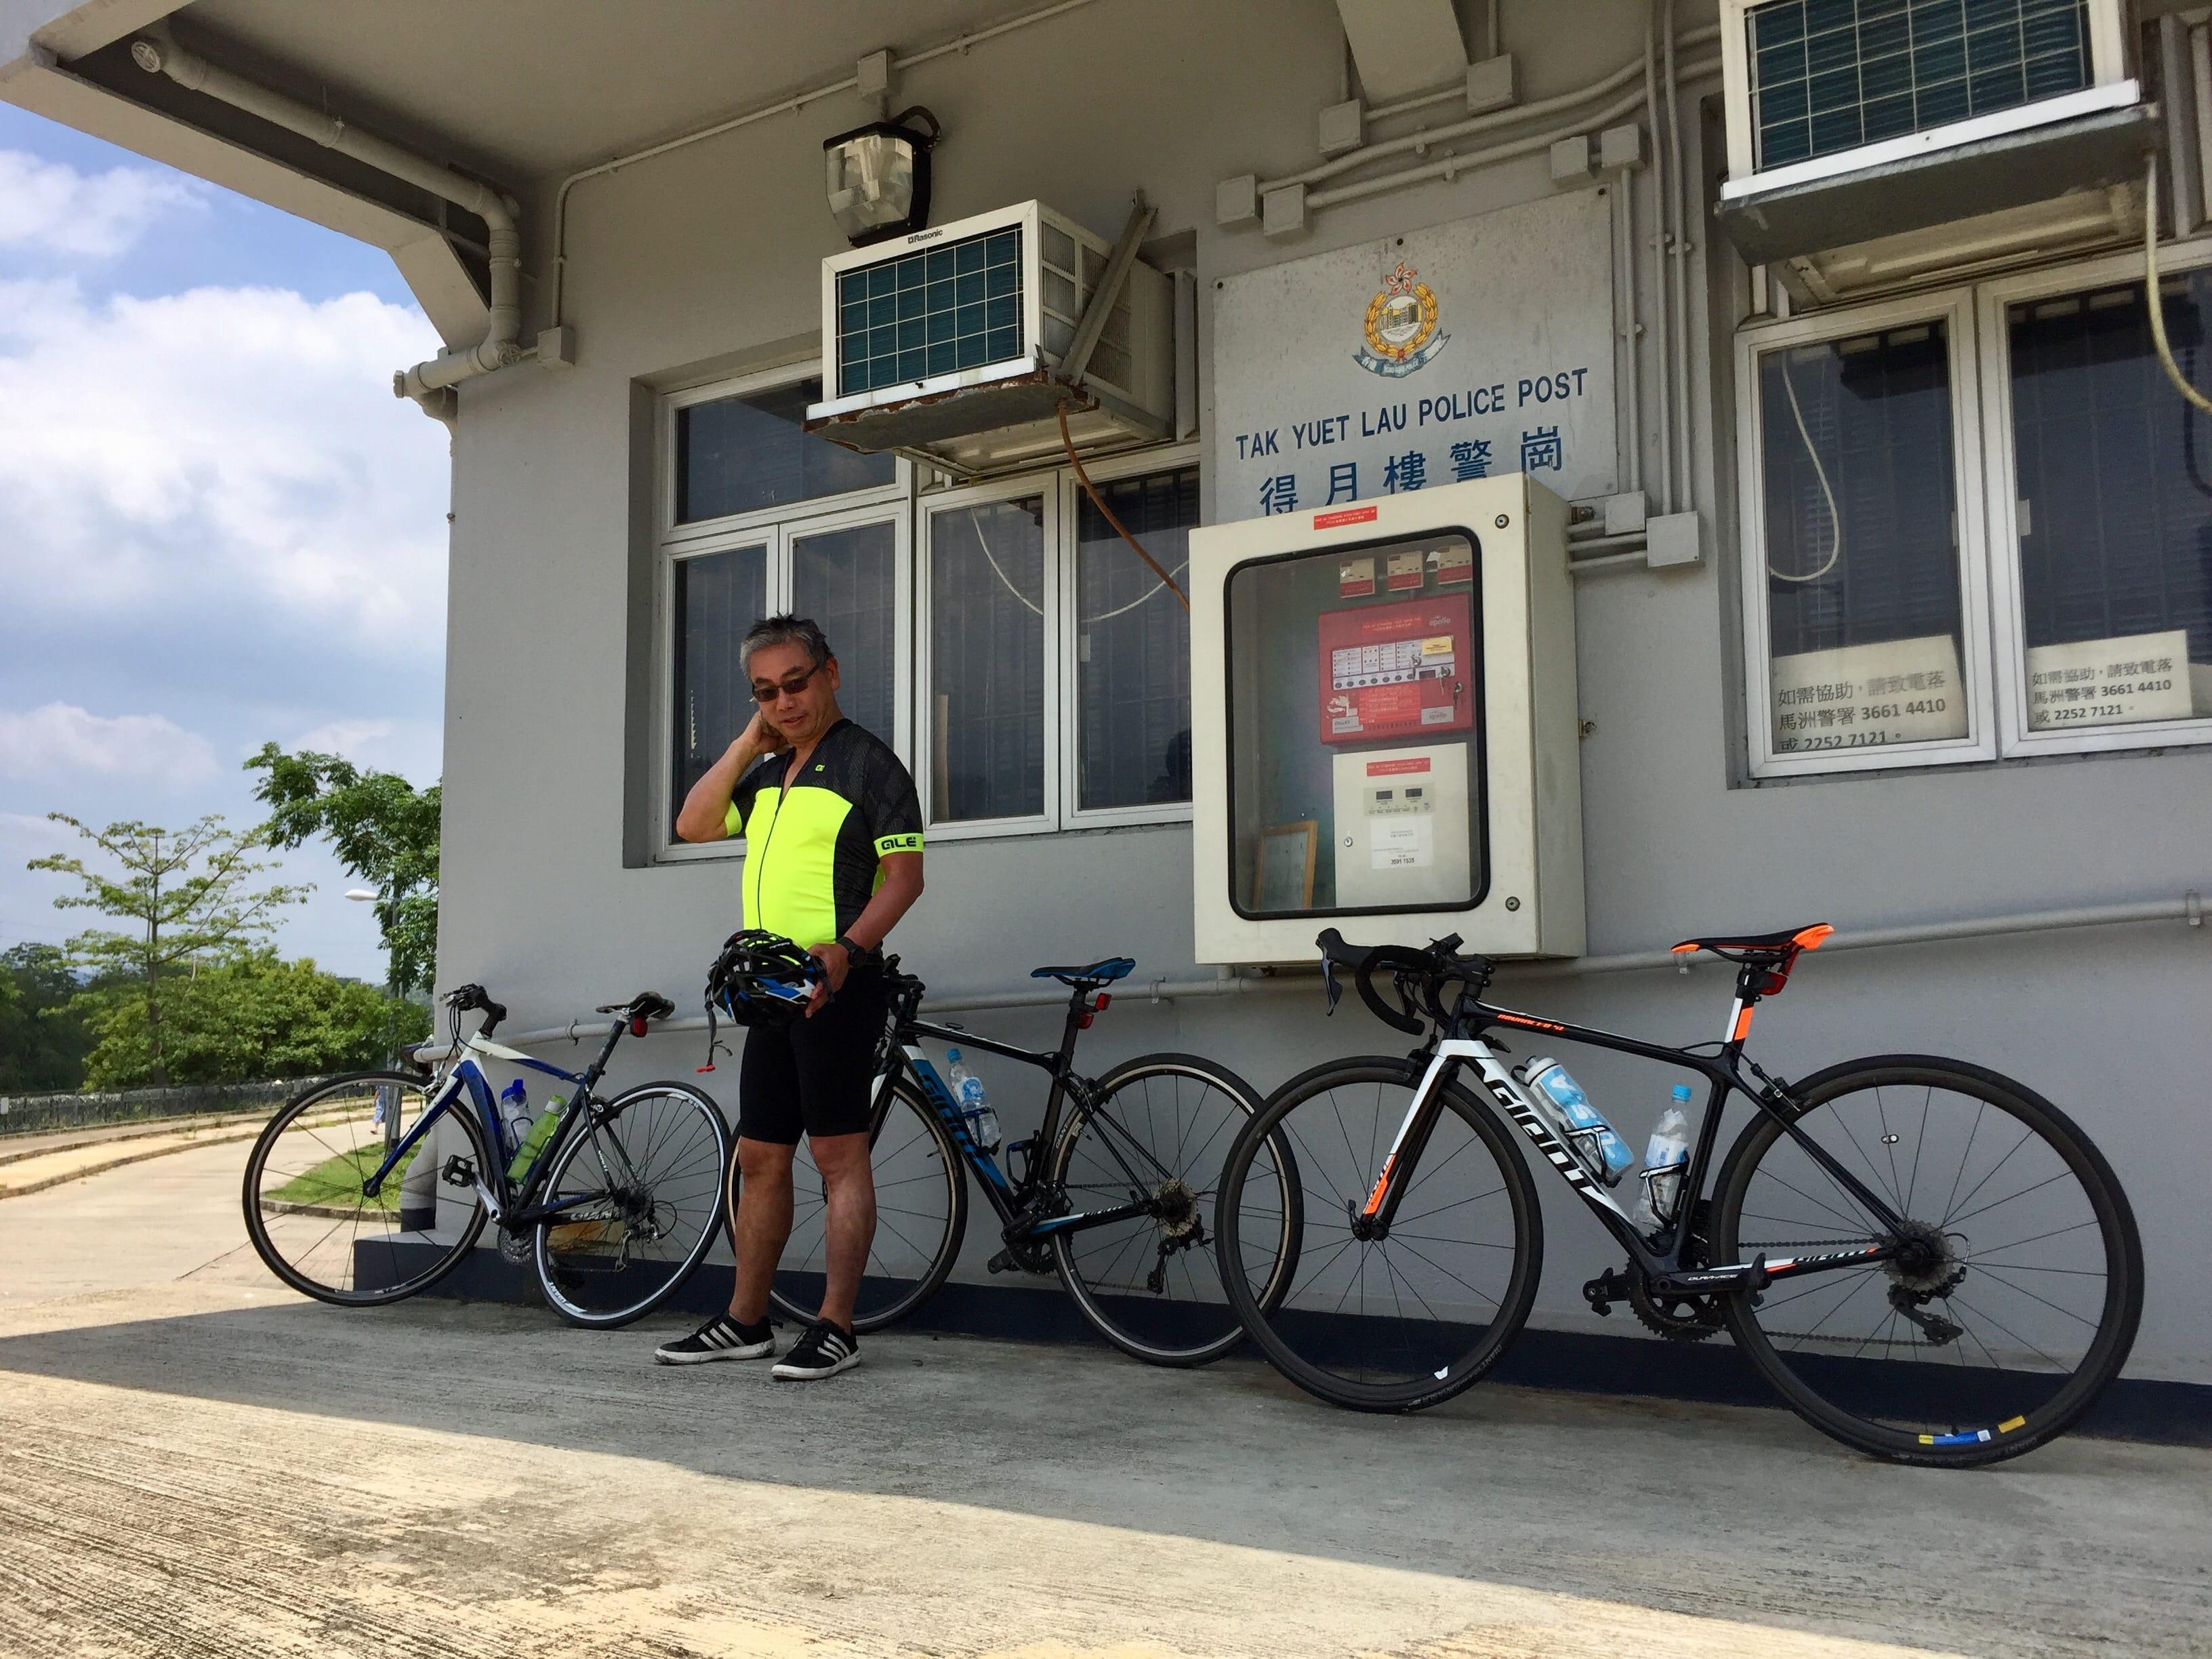 Short break at the Tak Yet Lau Police Post